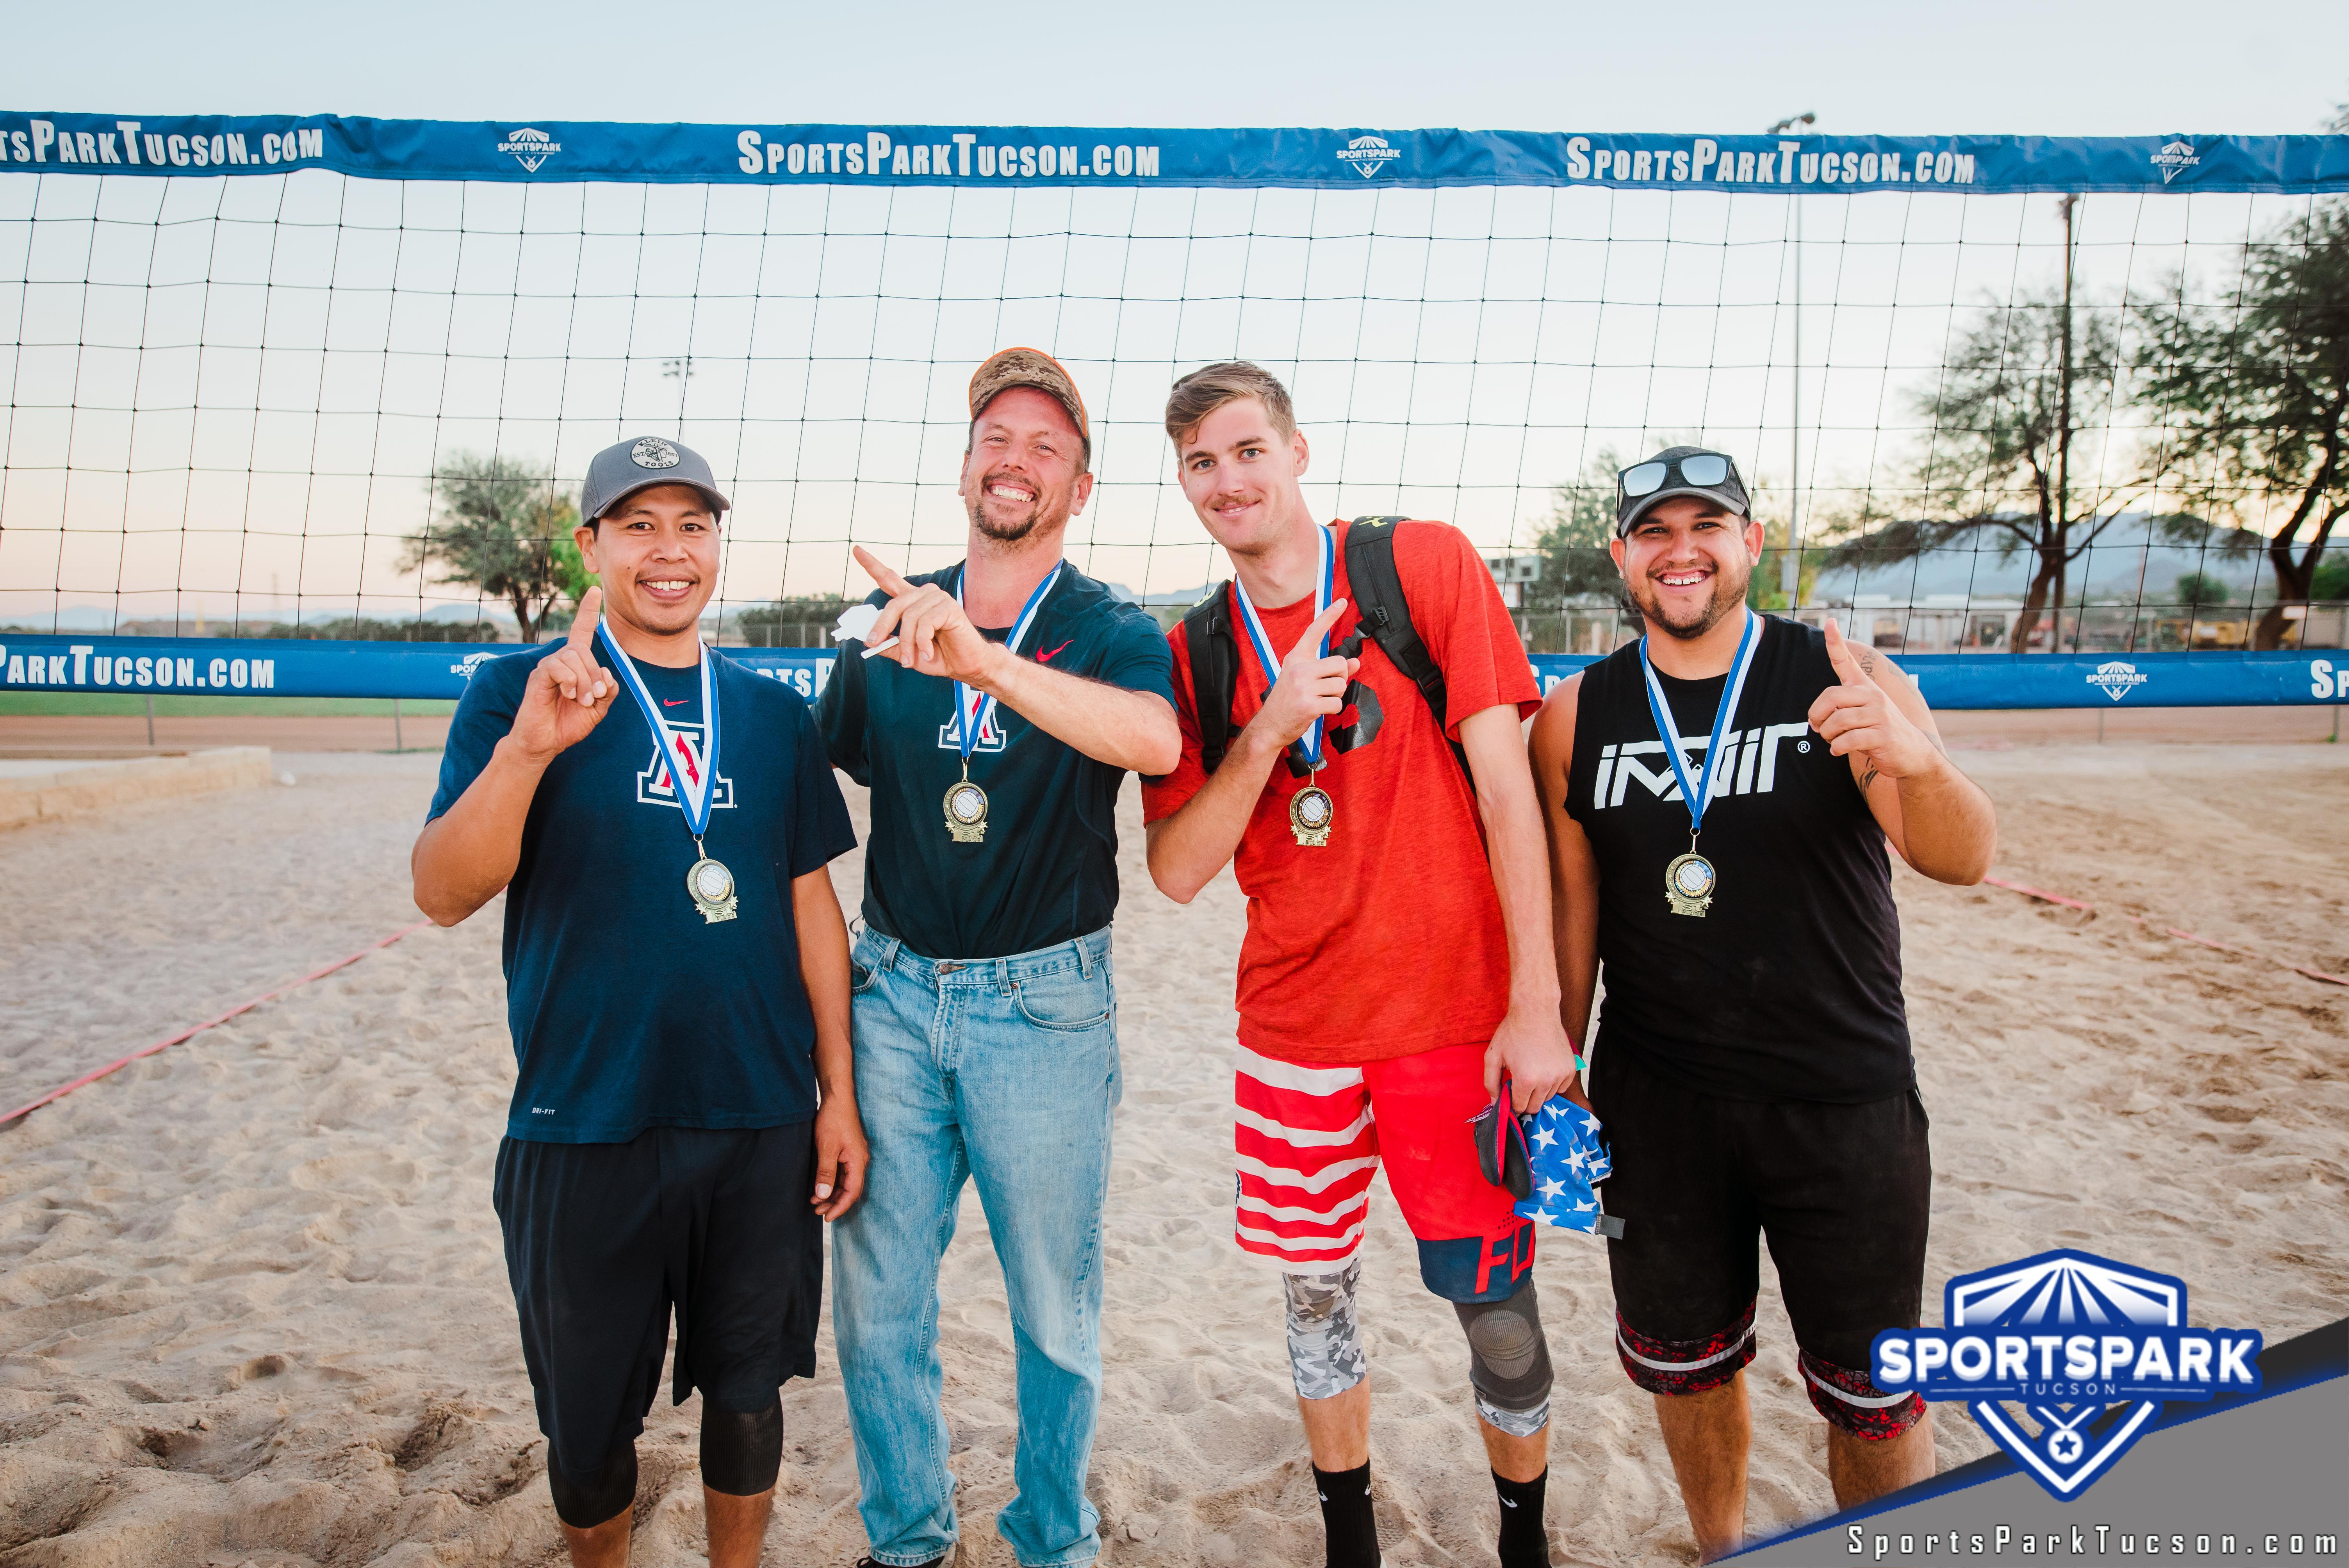 Nov 10th RWB Volleyball Tournament Men's 4v4 - A/B Champions